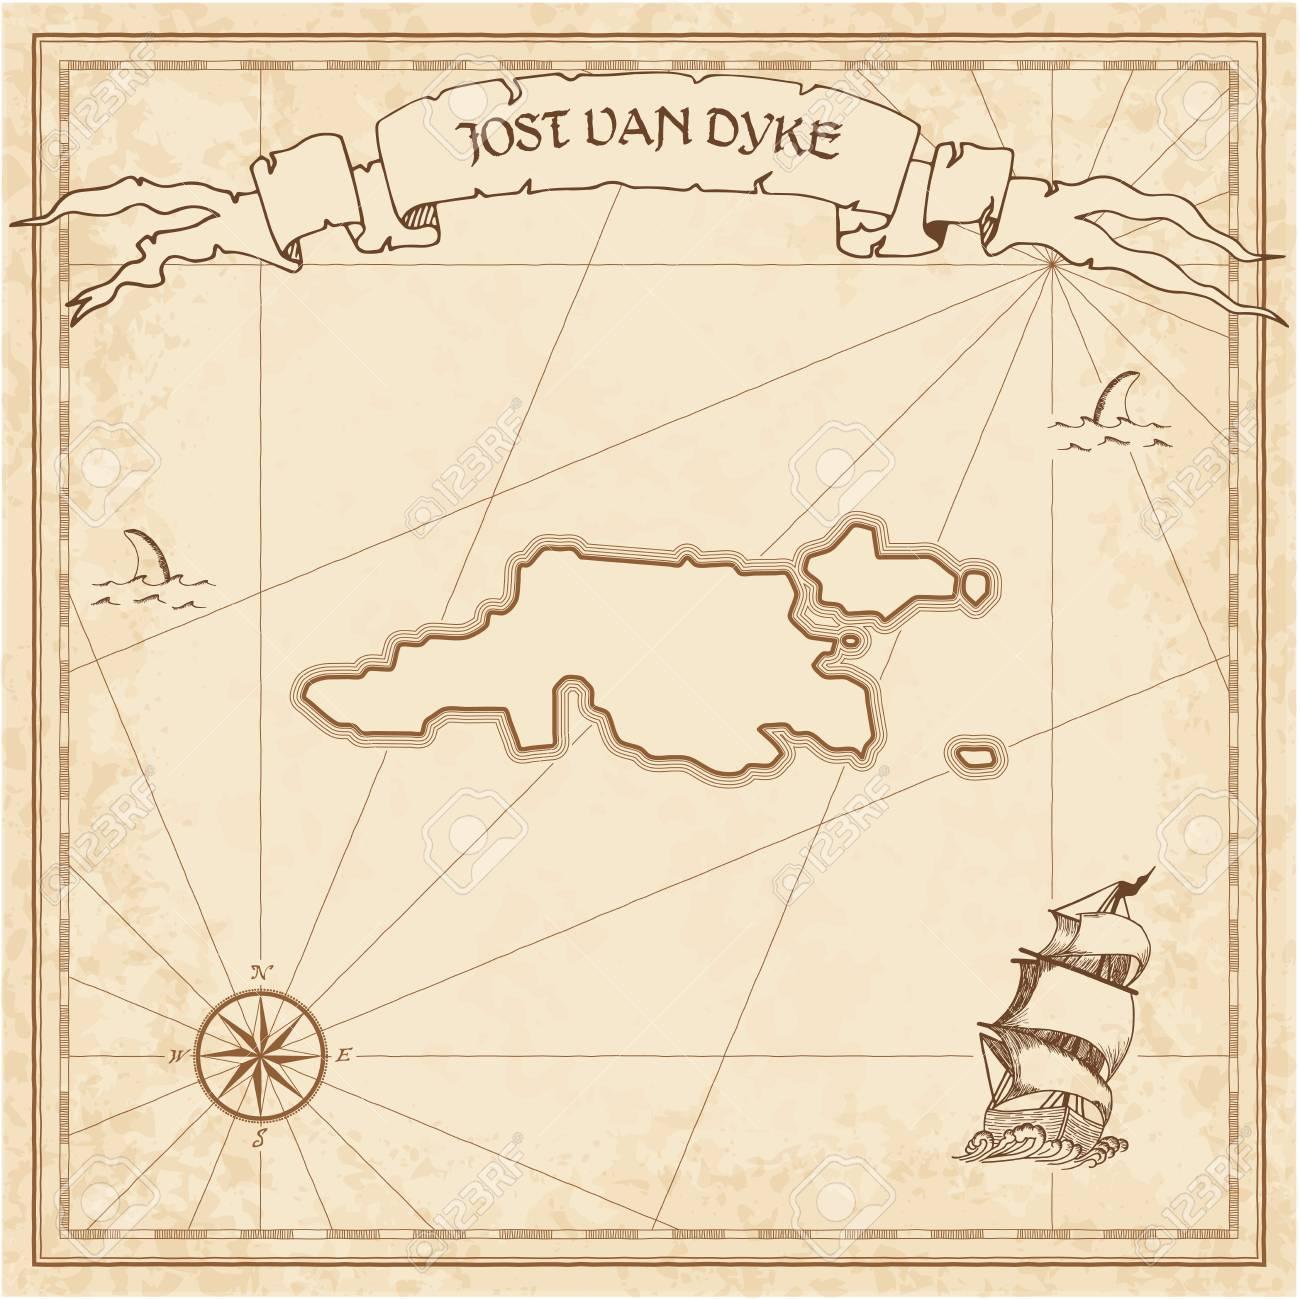 Jost Van Dyke Old Treasure Map Sepia Engraved Template Of Pirate